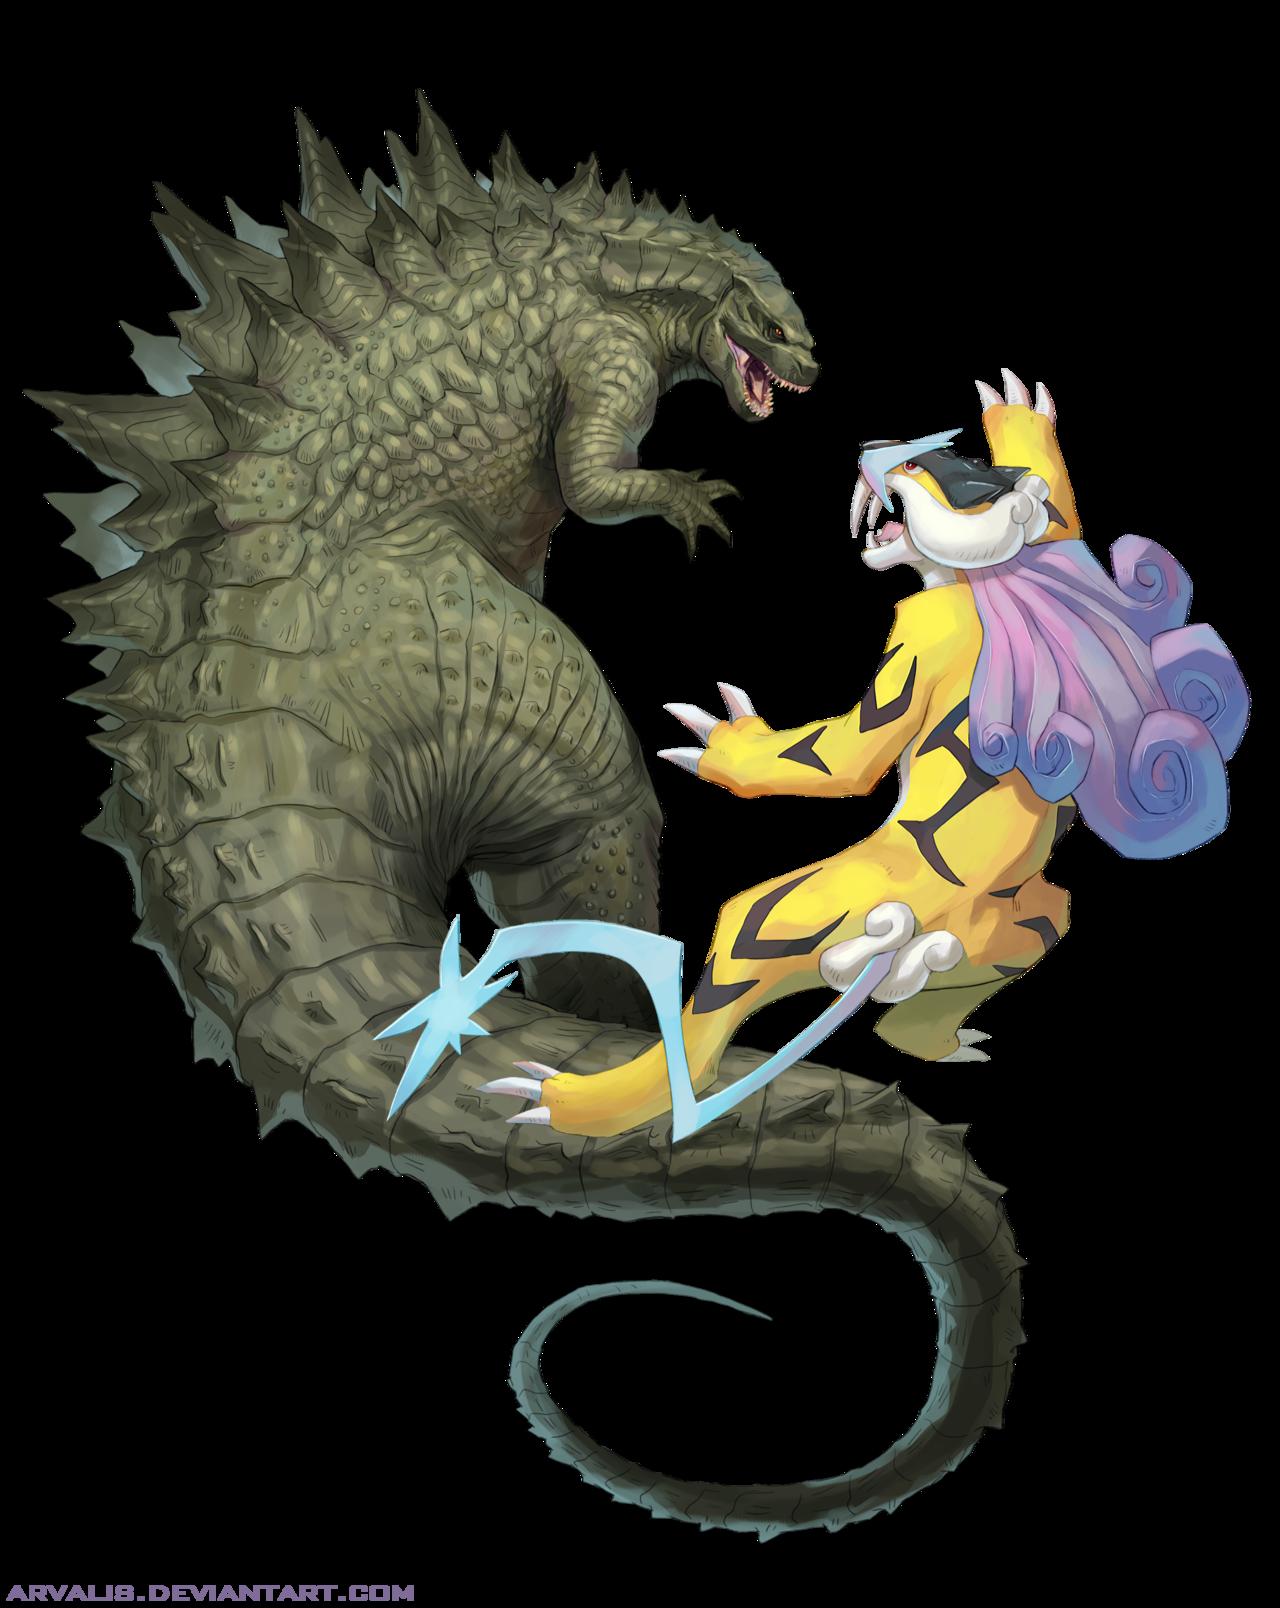 Godzilla vs. Raikou by arvalis.deviantart.com on @DeviantArt